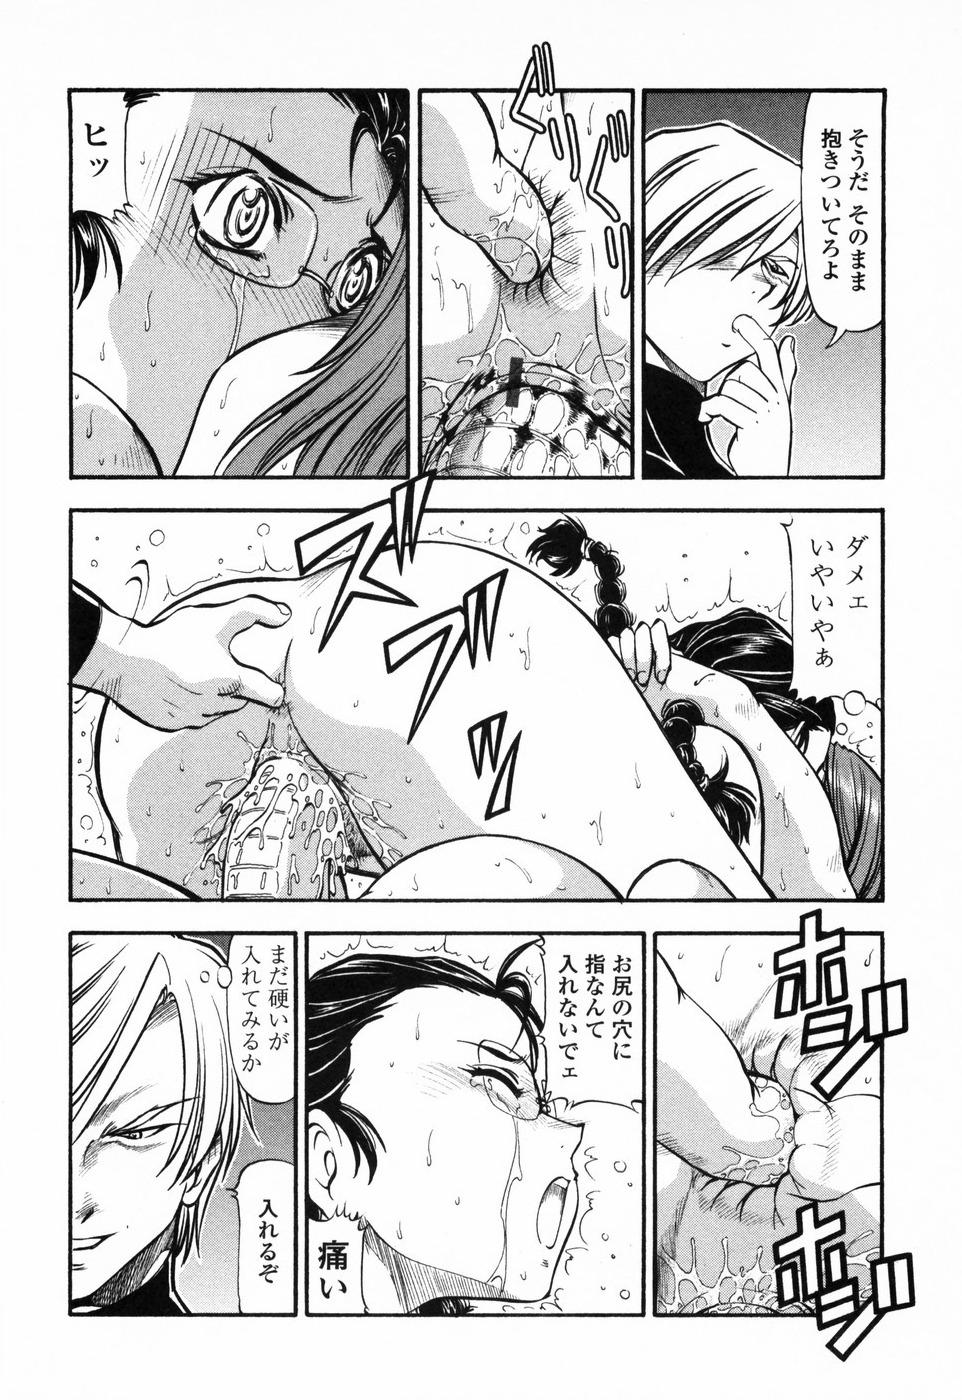 Kichiku Houteishiki - Equation of brutal person 63